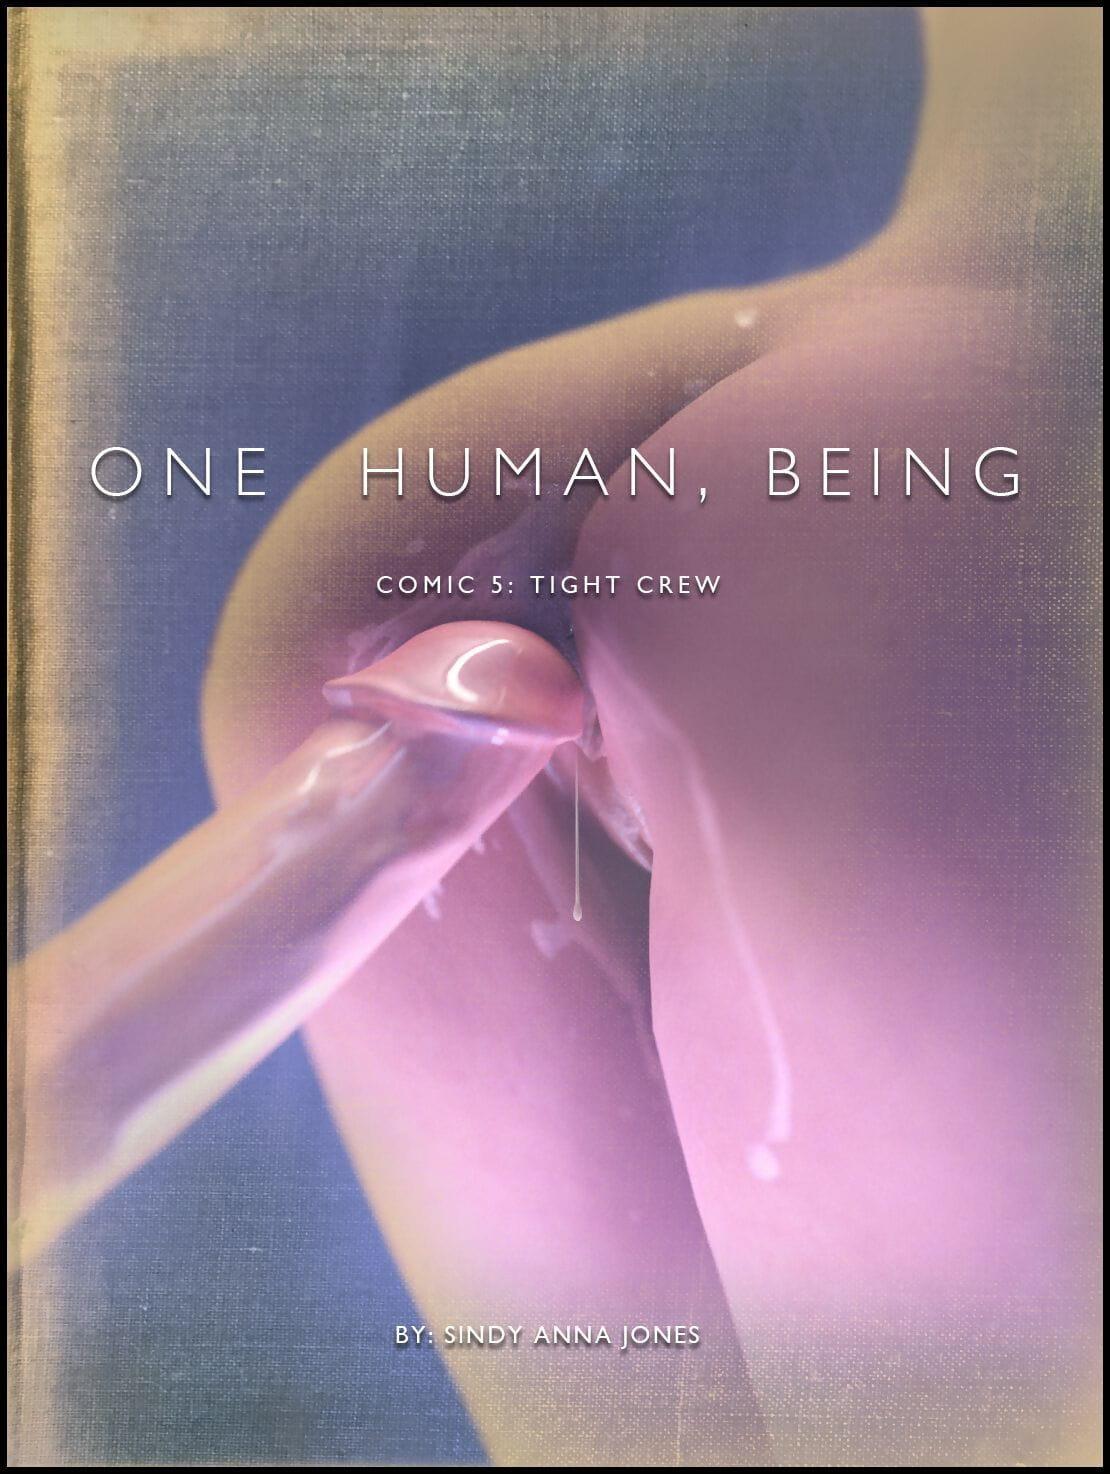 Sindy Anna Jones ~ Yoke Human- Being. 05: Penurious Top off